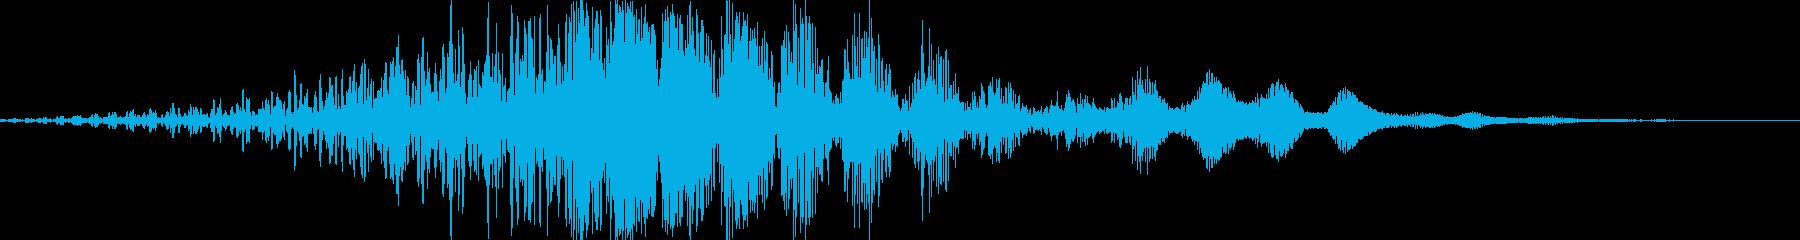 CINEMATIC WHOOSH 06の再生済みの波形